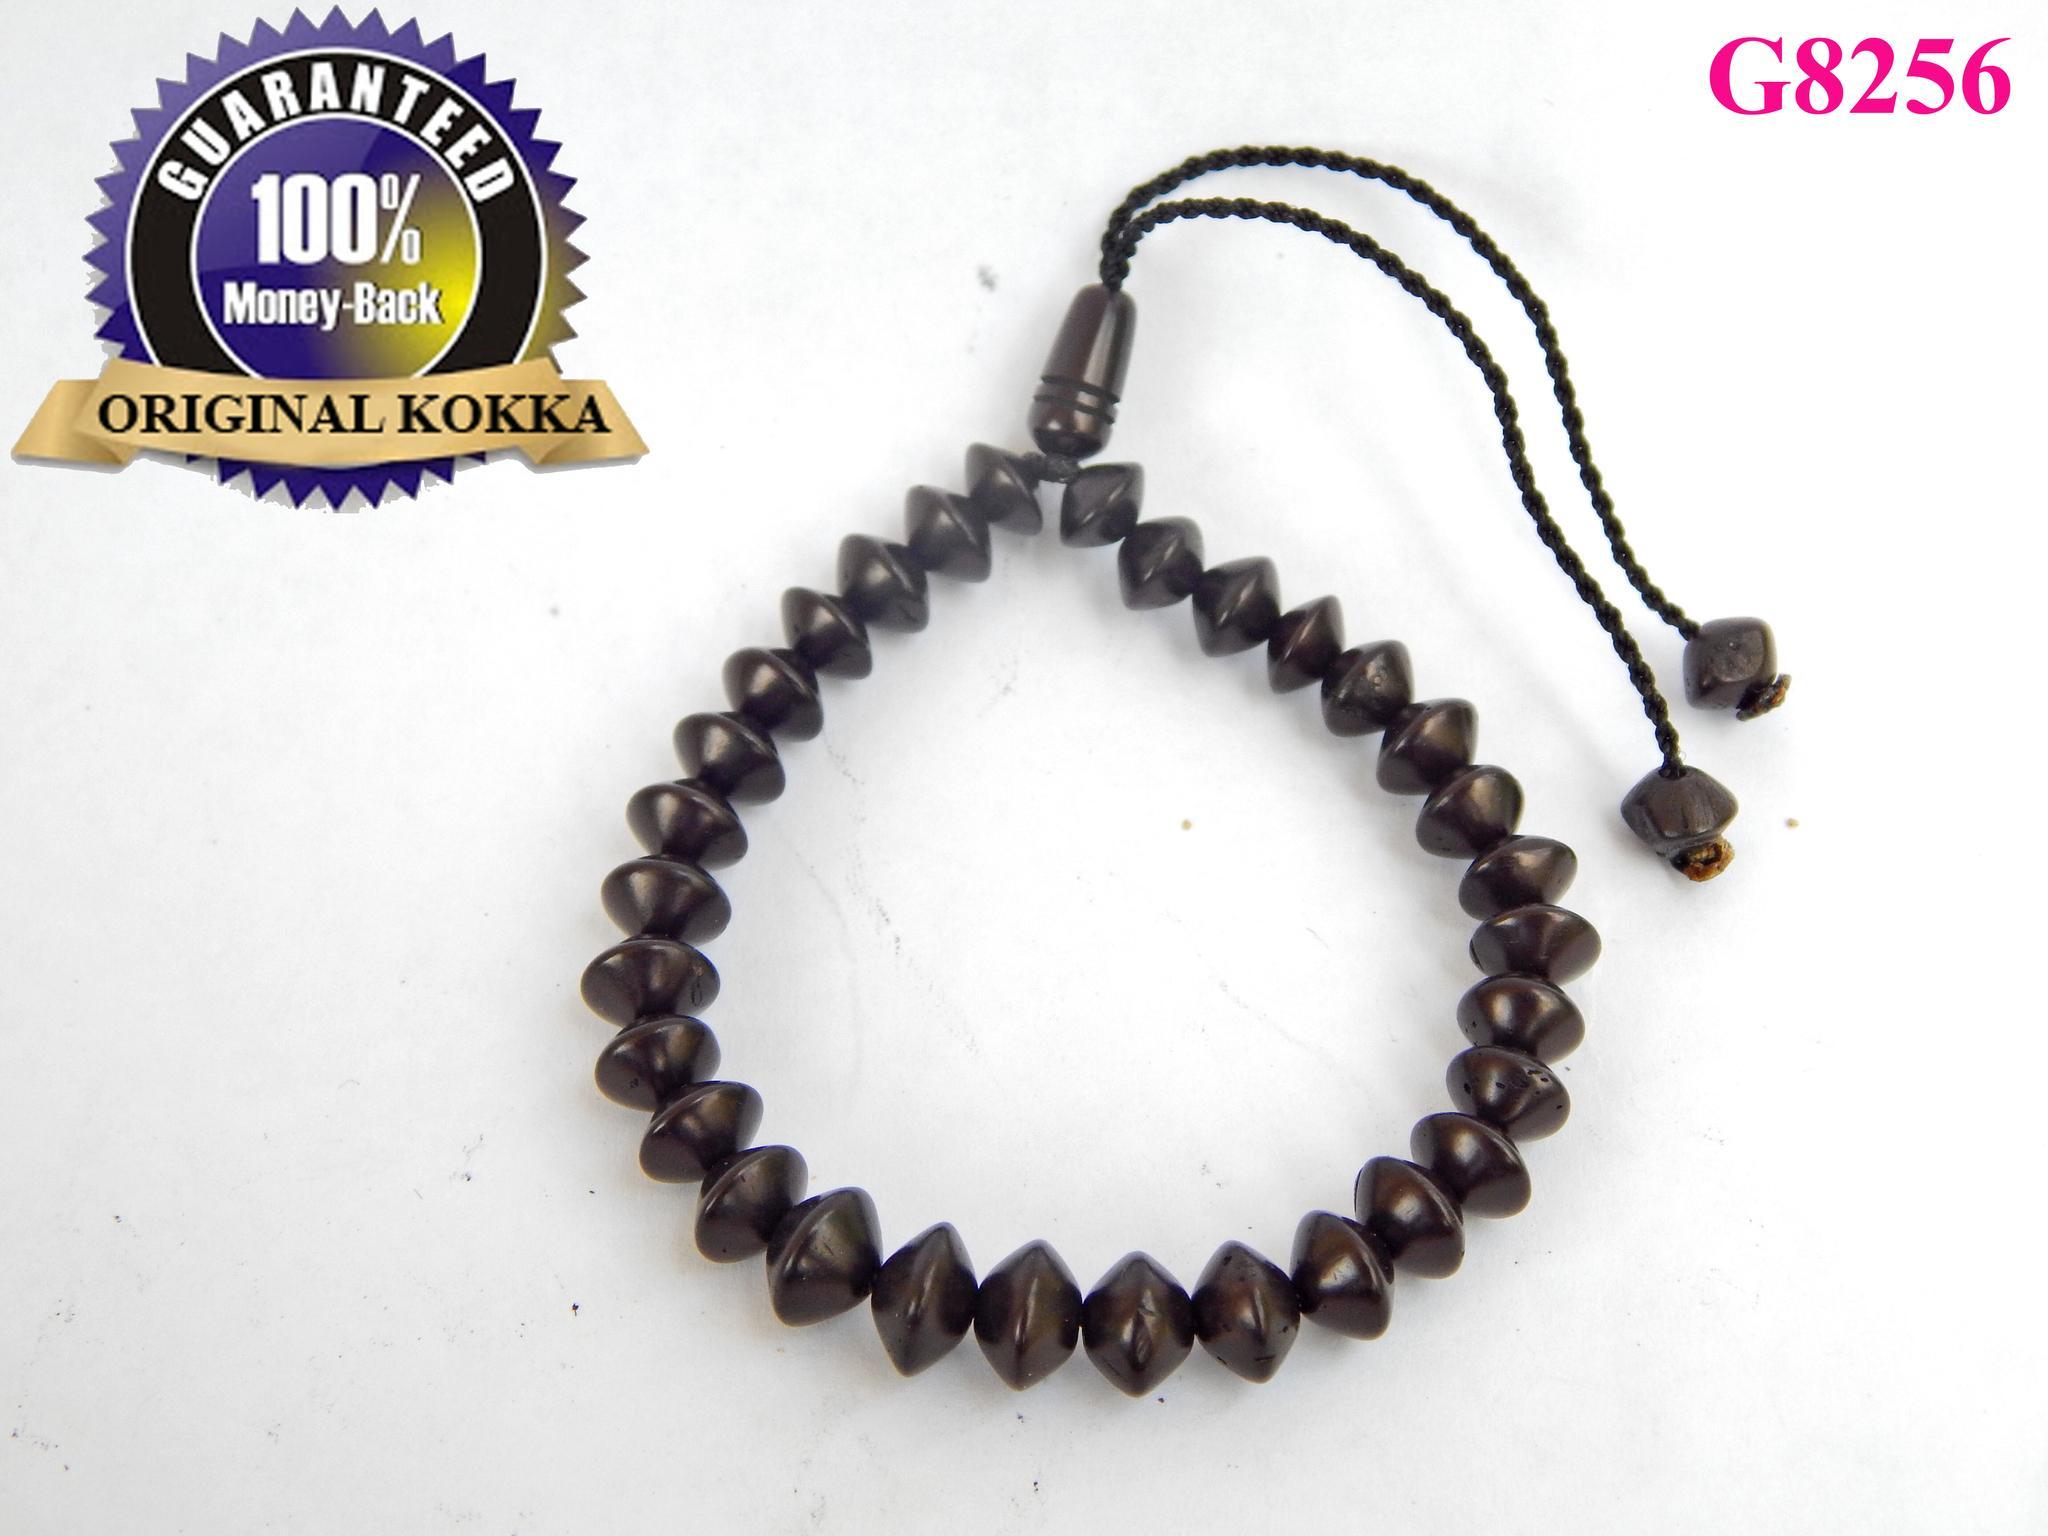 Diskon Promo Perhiasan Aksesoris G8256 gelang kayu kokka warna hitam kokkah koka kokah Murah